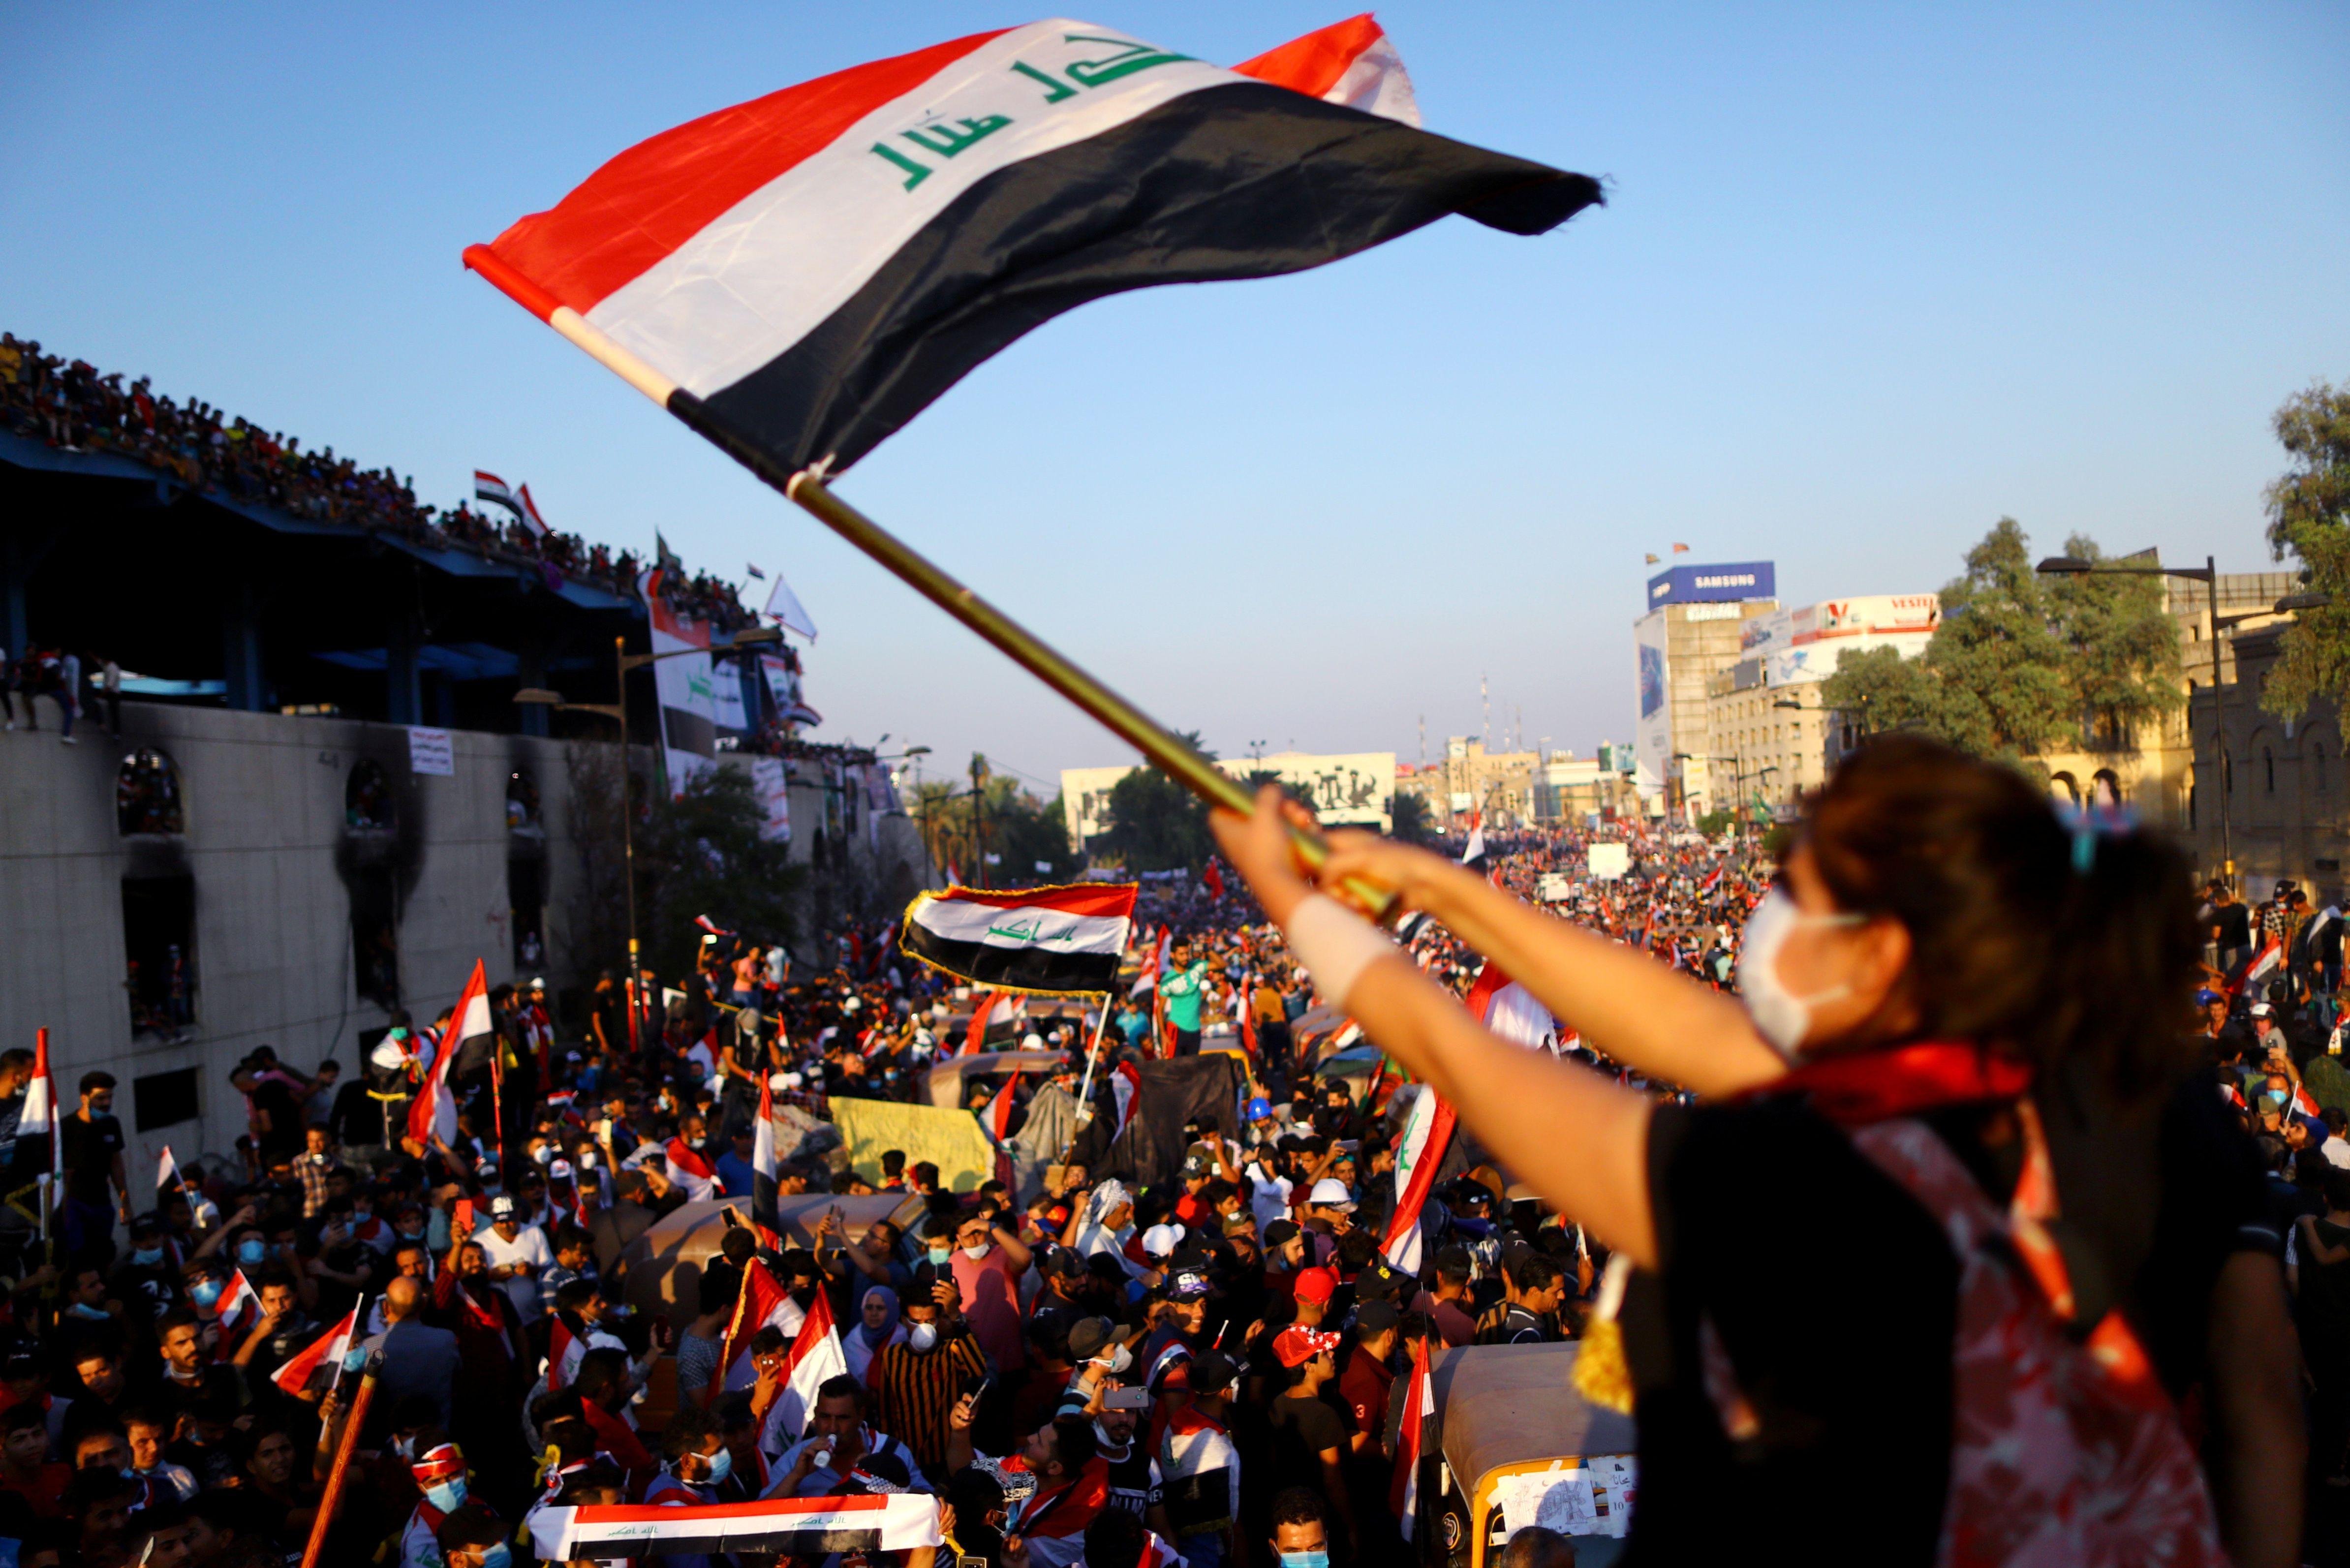 2019-11-01T165437Z_308595639_RC164BCA0C20_RTRMADP_3_IRAQ-PROTESTS